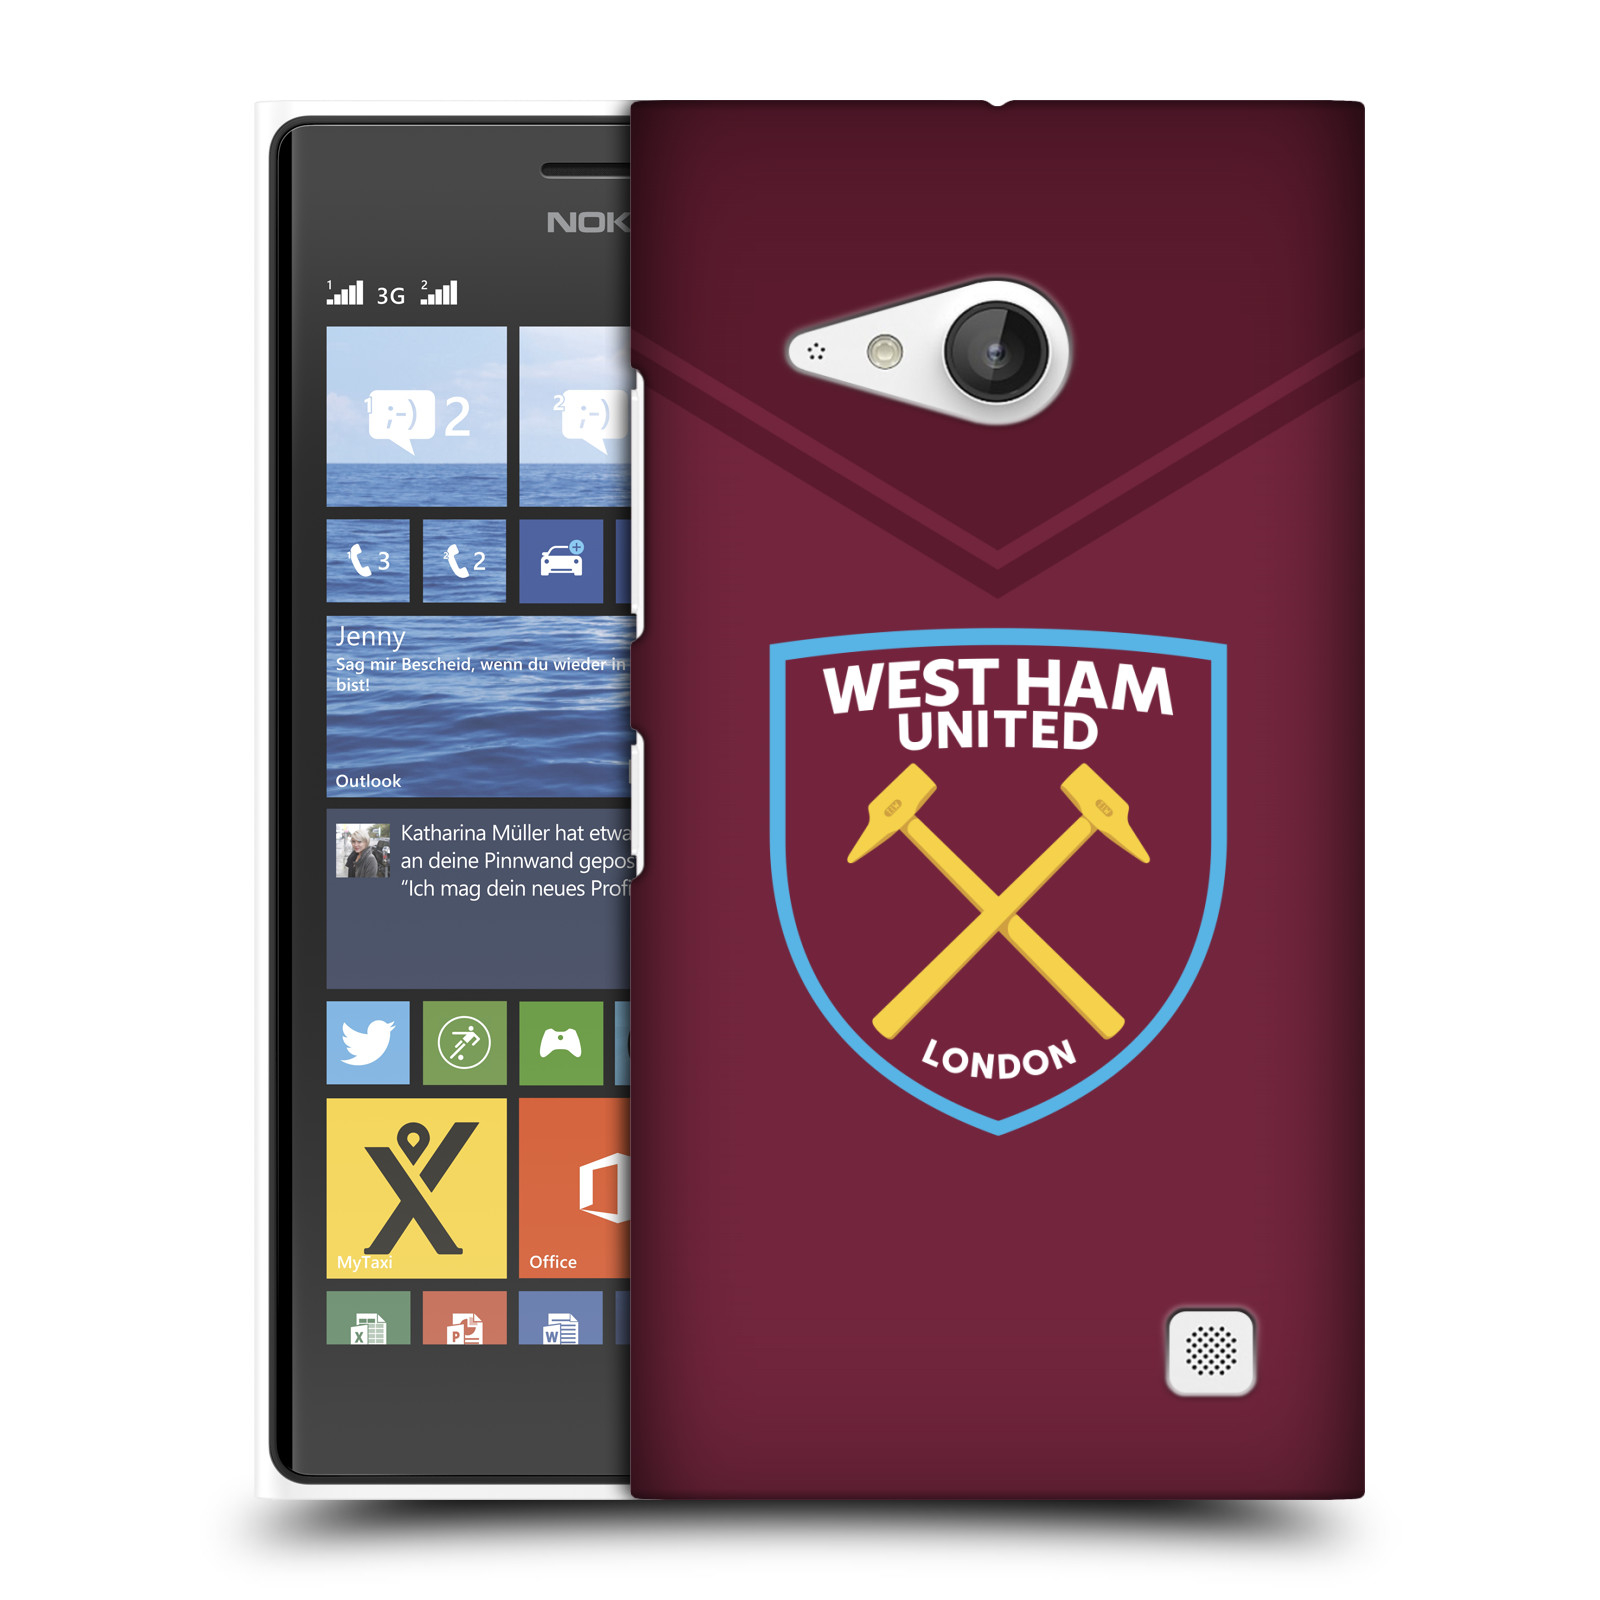 Plastové pouzdro na mobil Nokia Lumia 730 Dual SIM - Head Case - West Ham United - Logo (Plastový kryt či obal na mobilní telefon s motivem West Ham United - Kladiváři - Logo pro Nokia Lumia 730 Dual SIM)